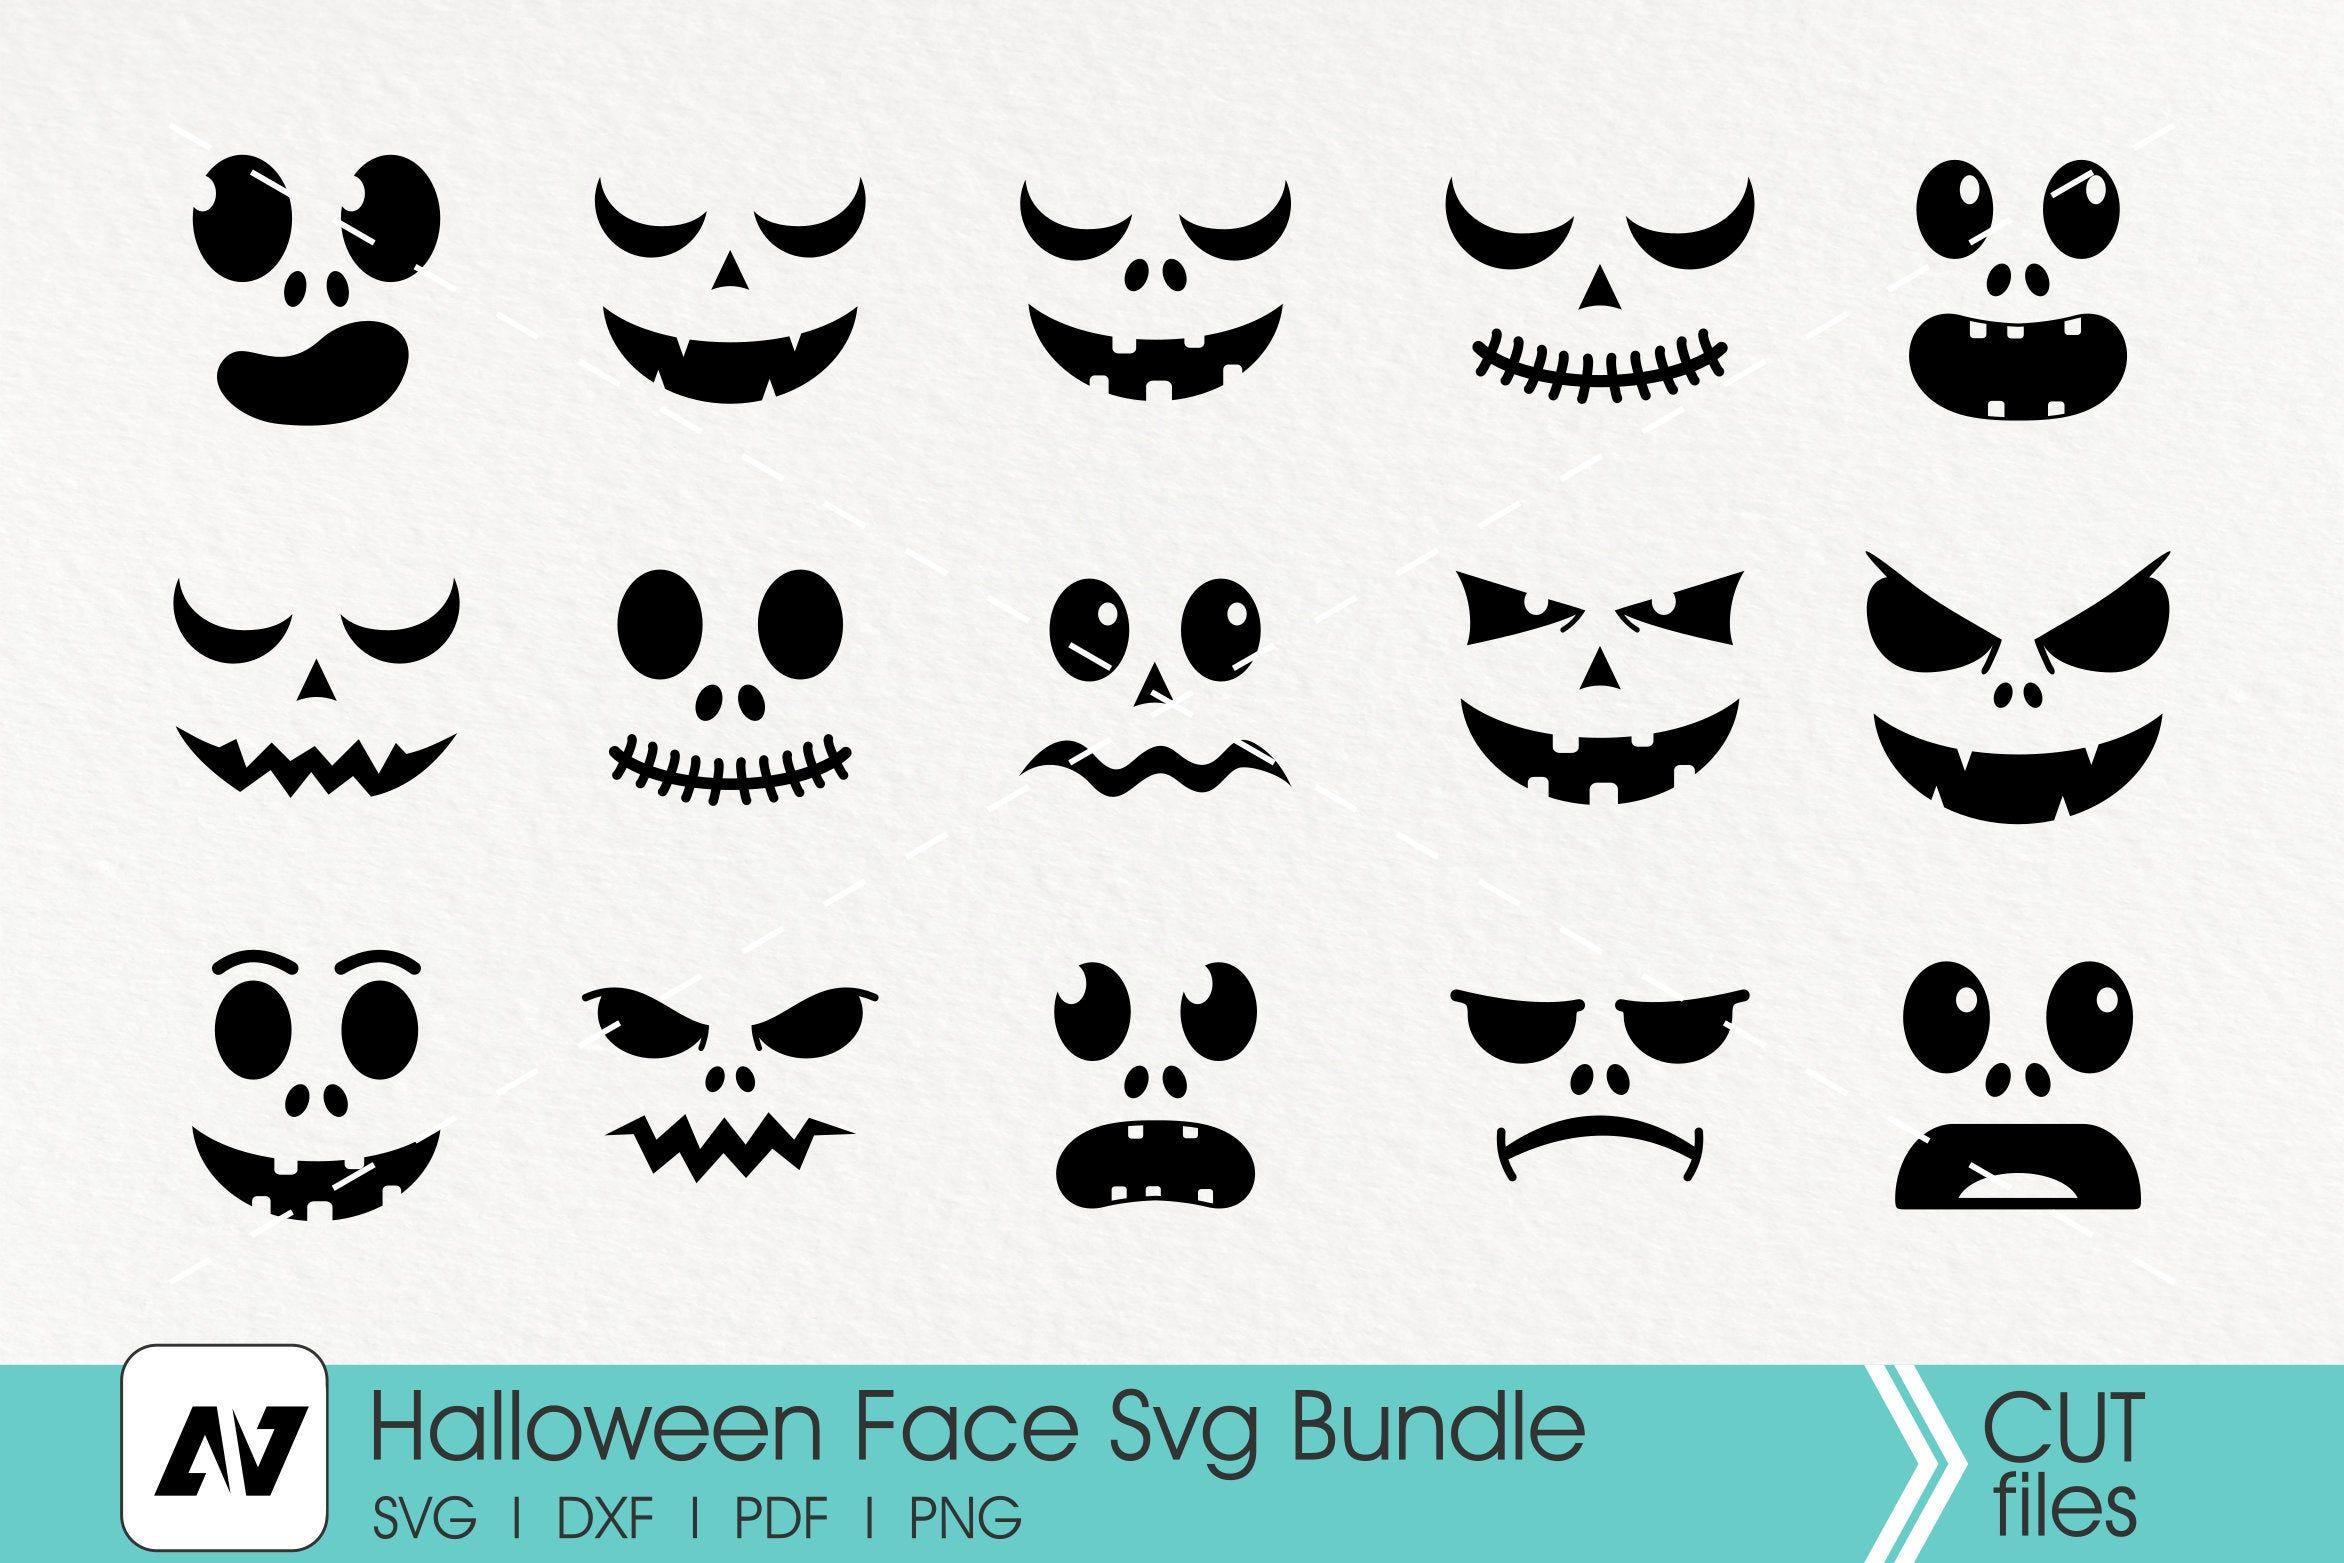 Halloween Face Svg Scary Face Svg Pumpkin Face Svg Etsy